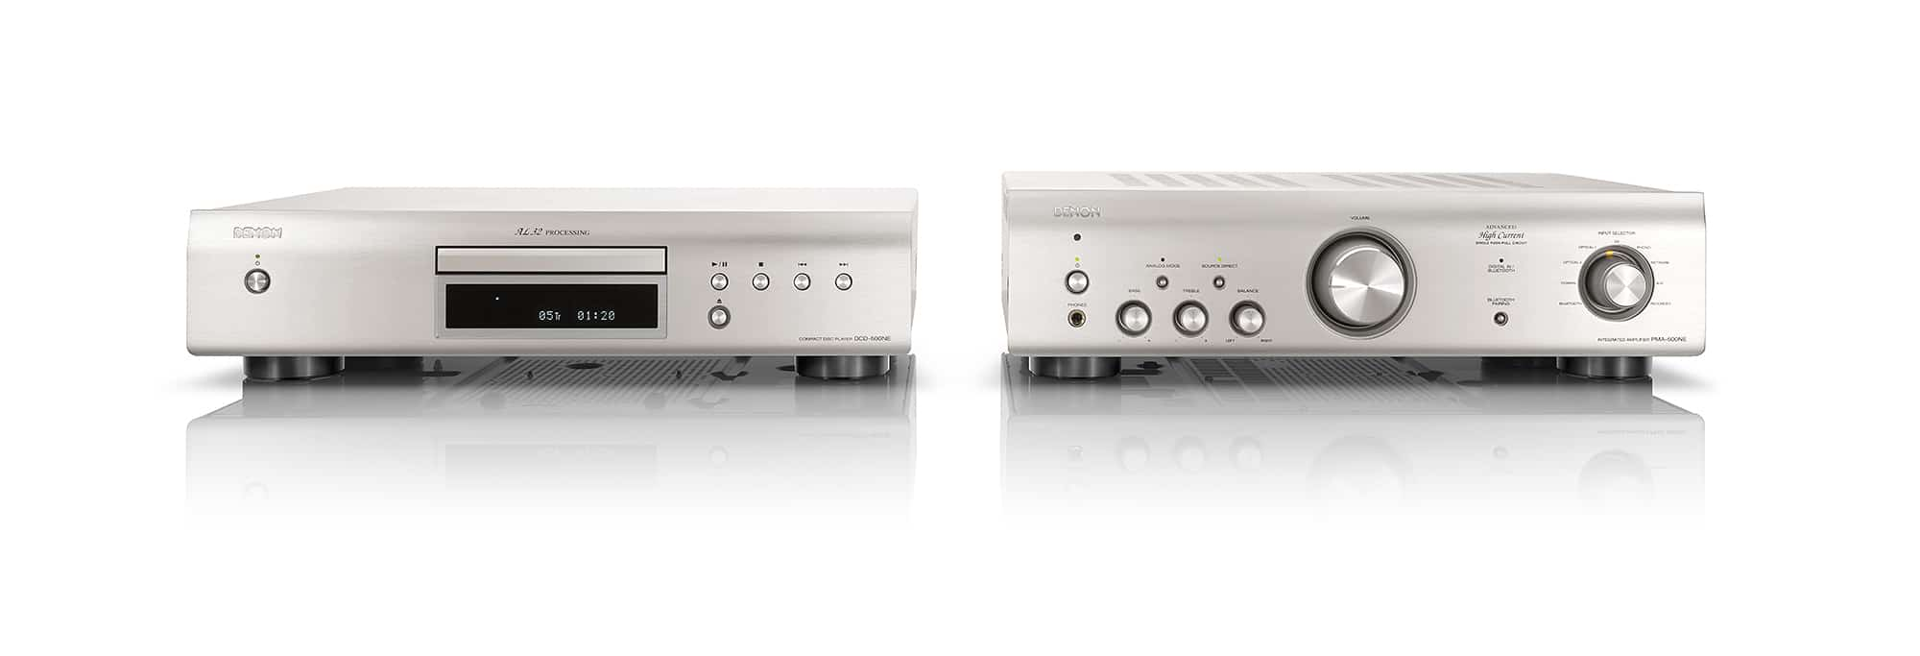 amplificador Denon PMA-600NE